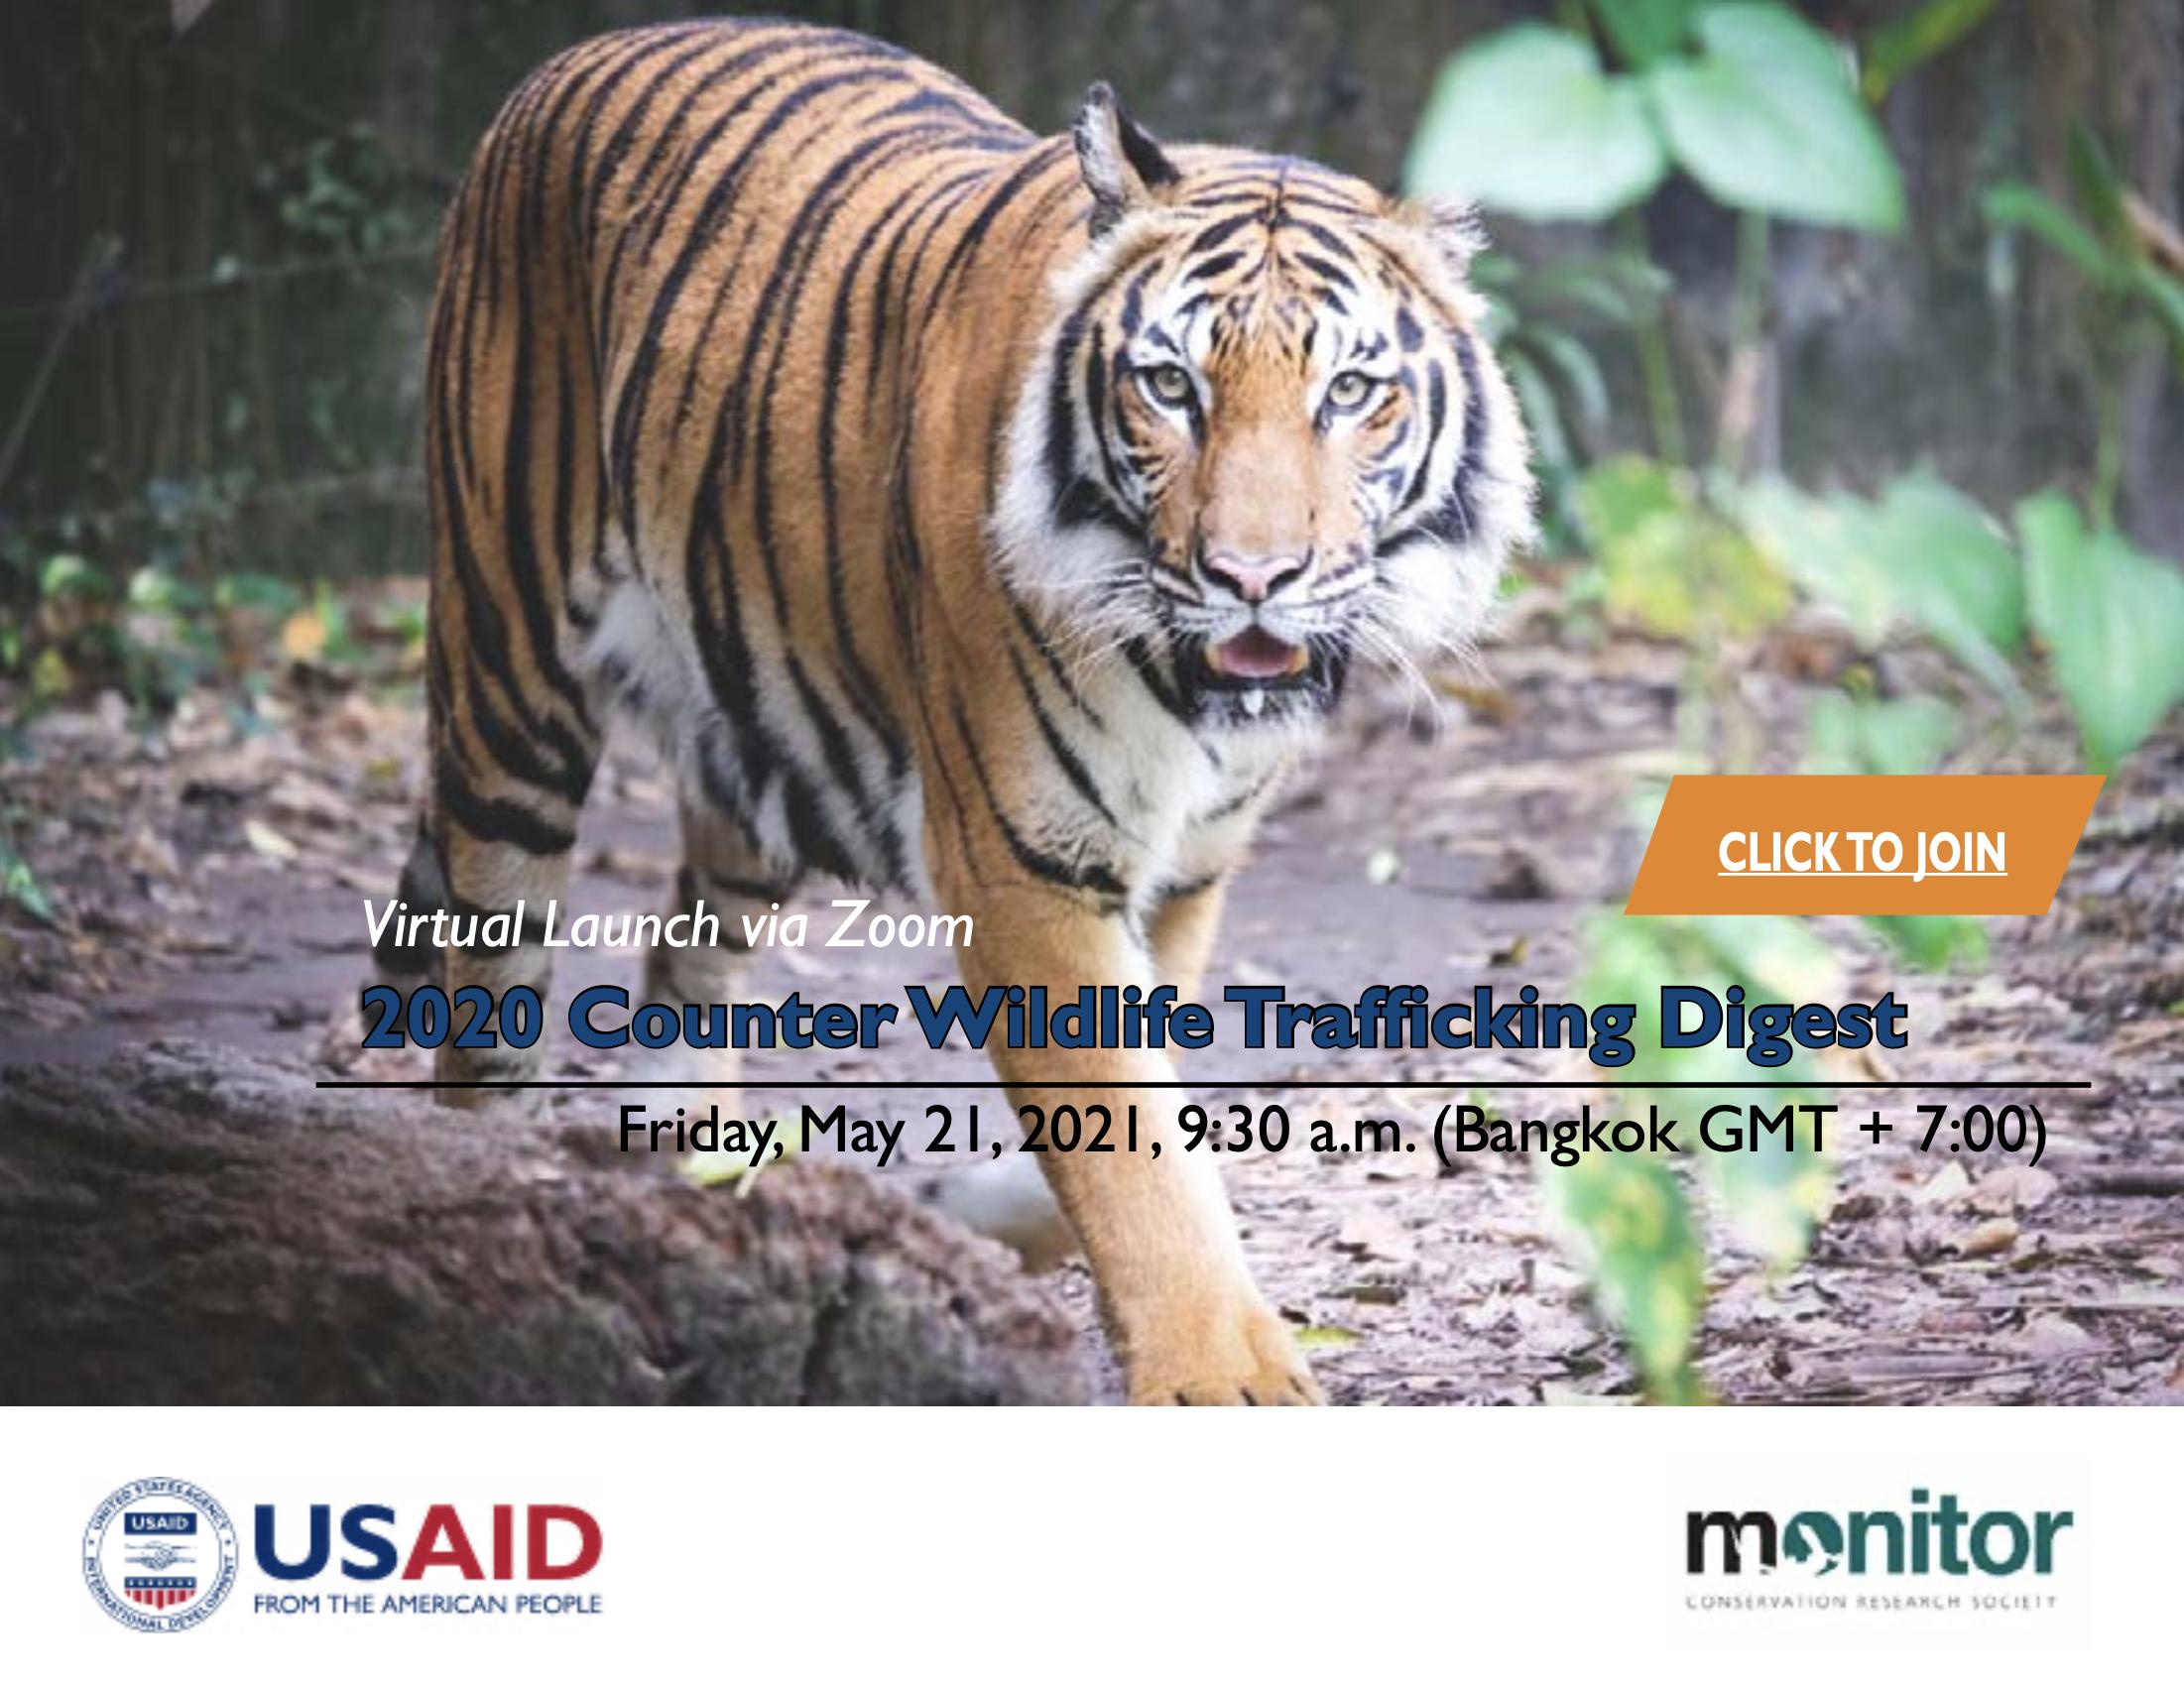 2020 Counter wildlife trafficking digest